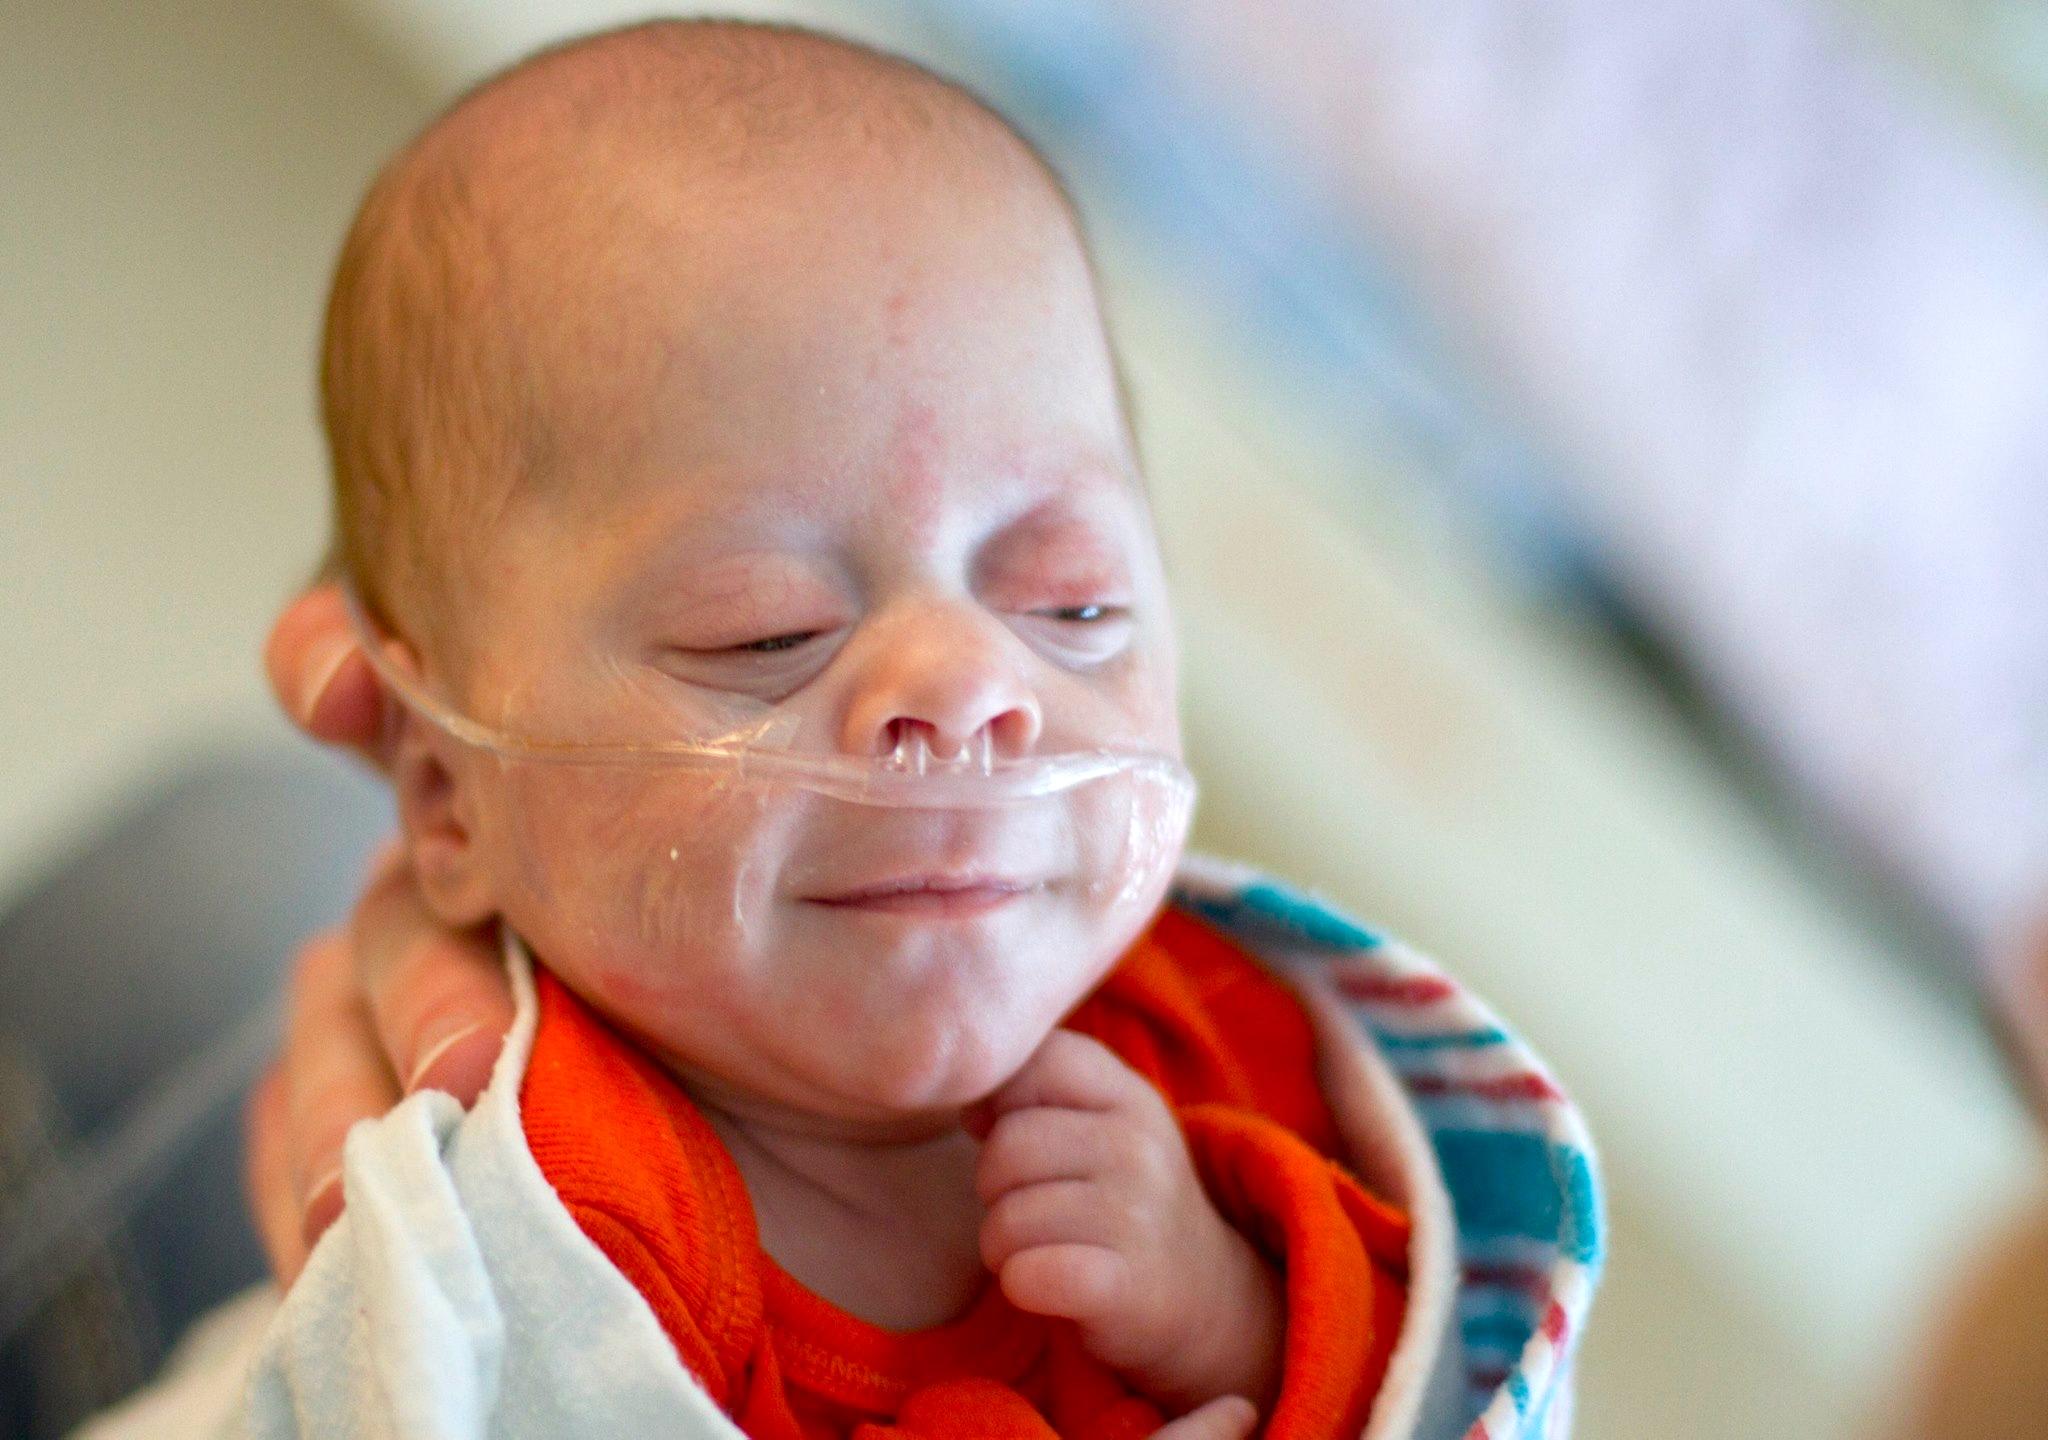 Smiling preemie